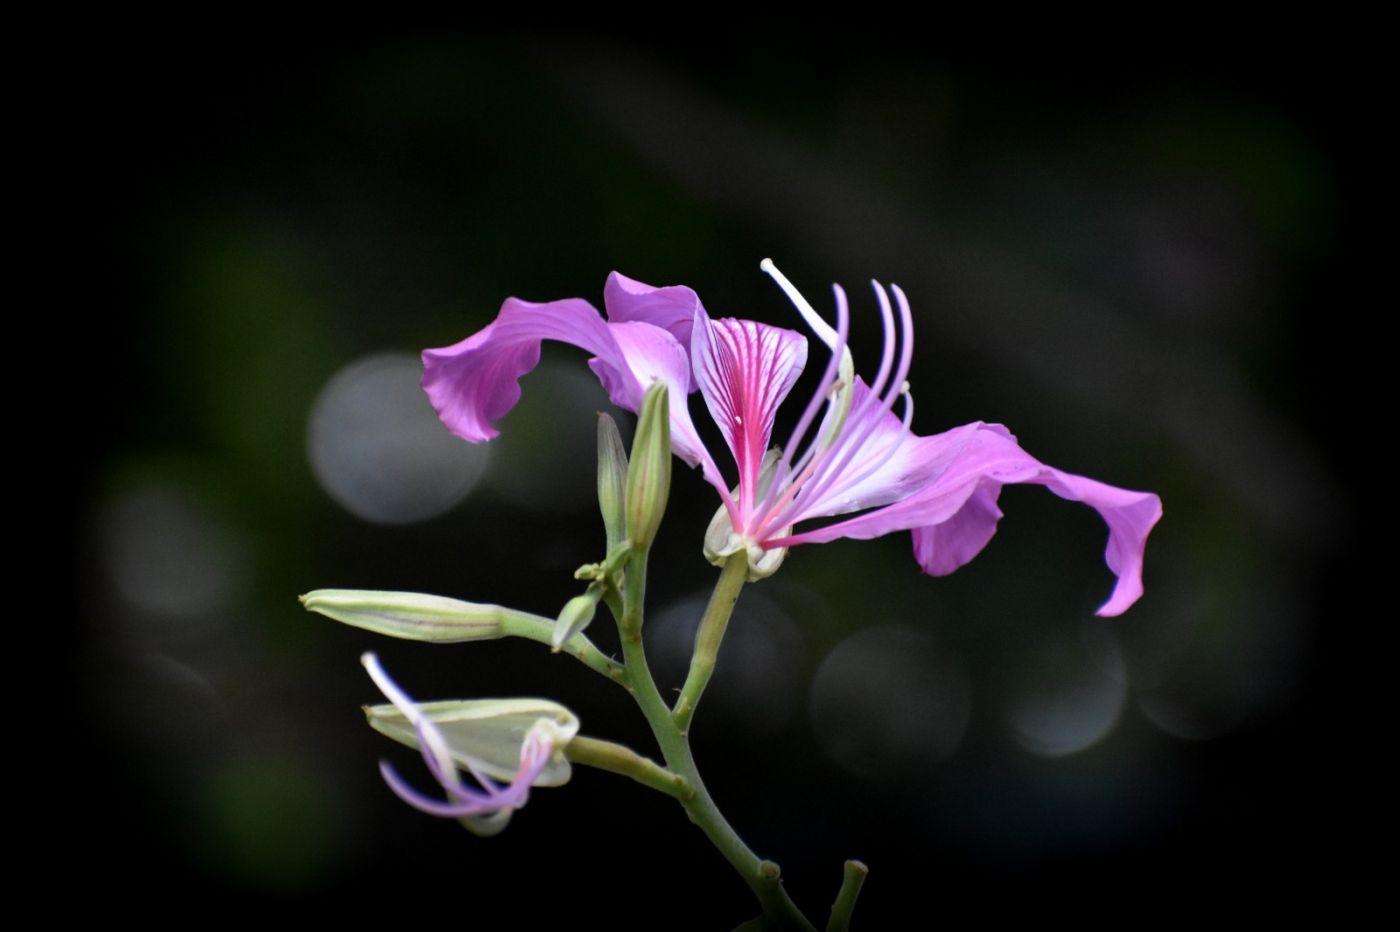 红花羊蹄甲_图1-5